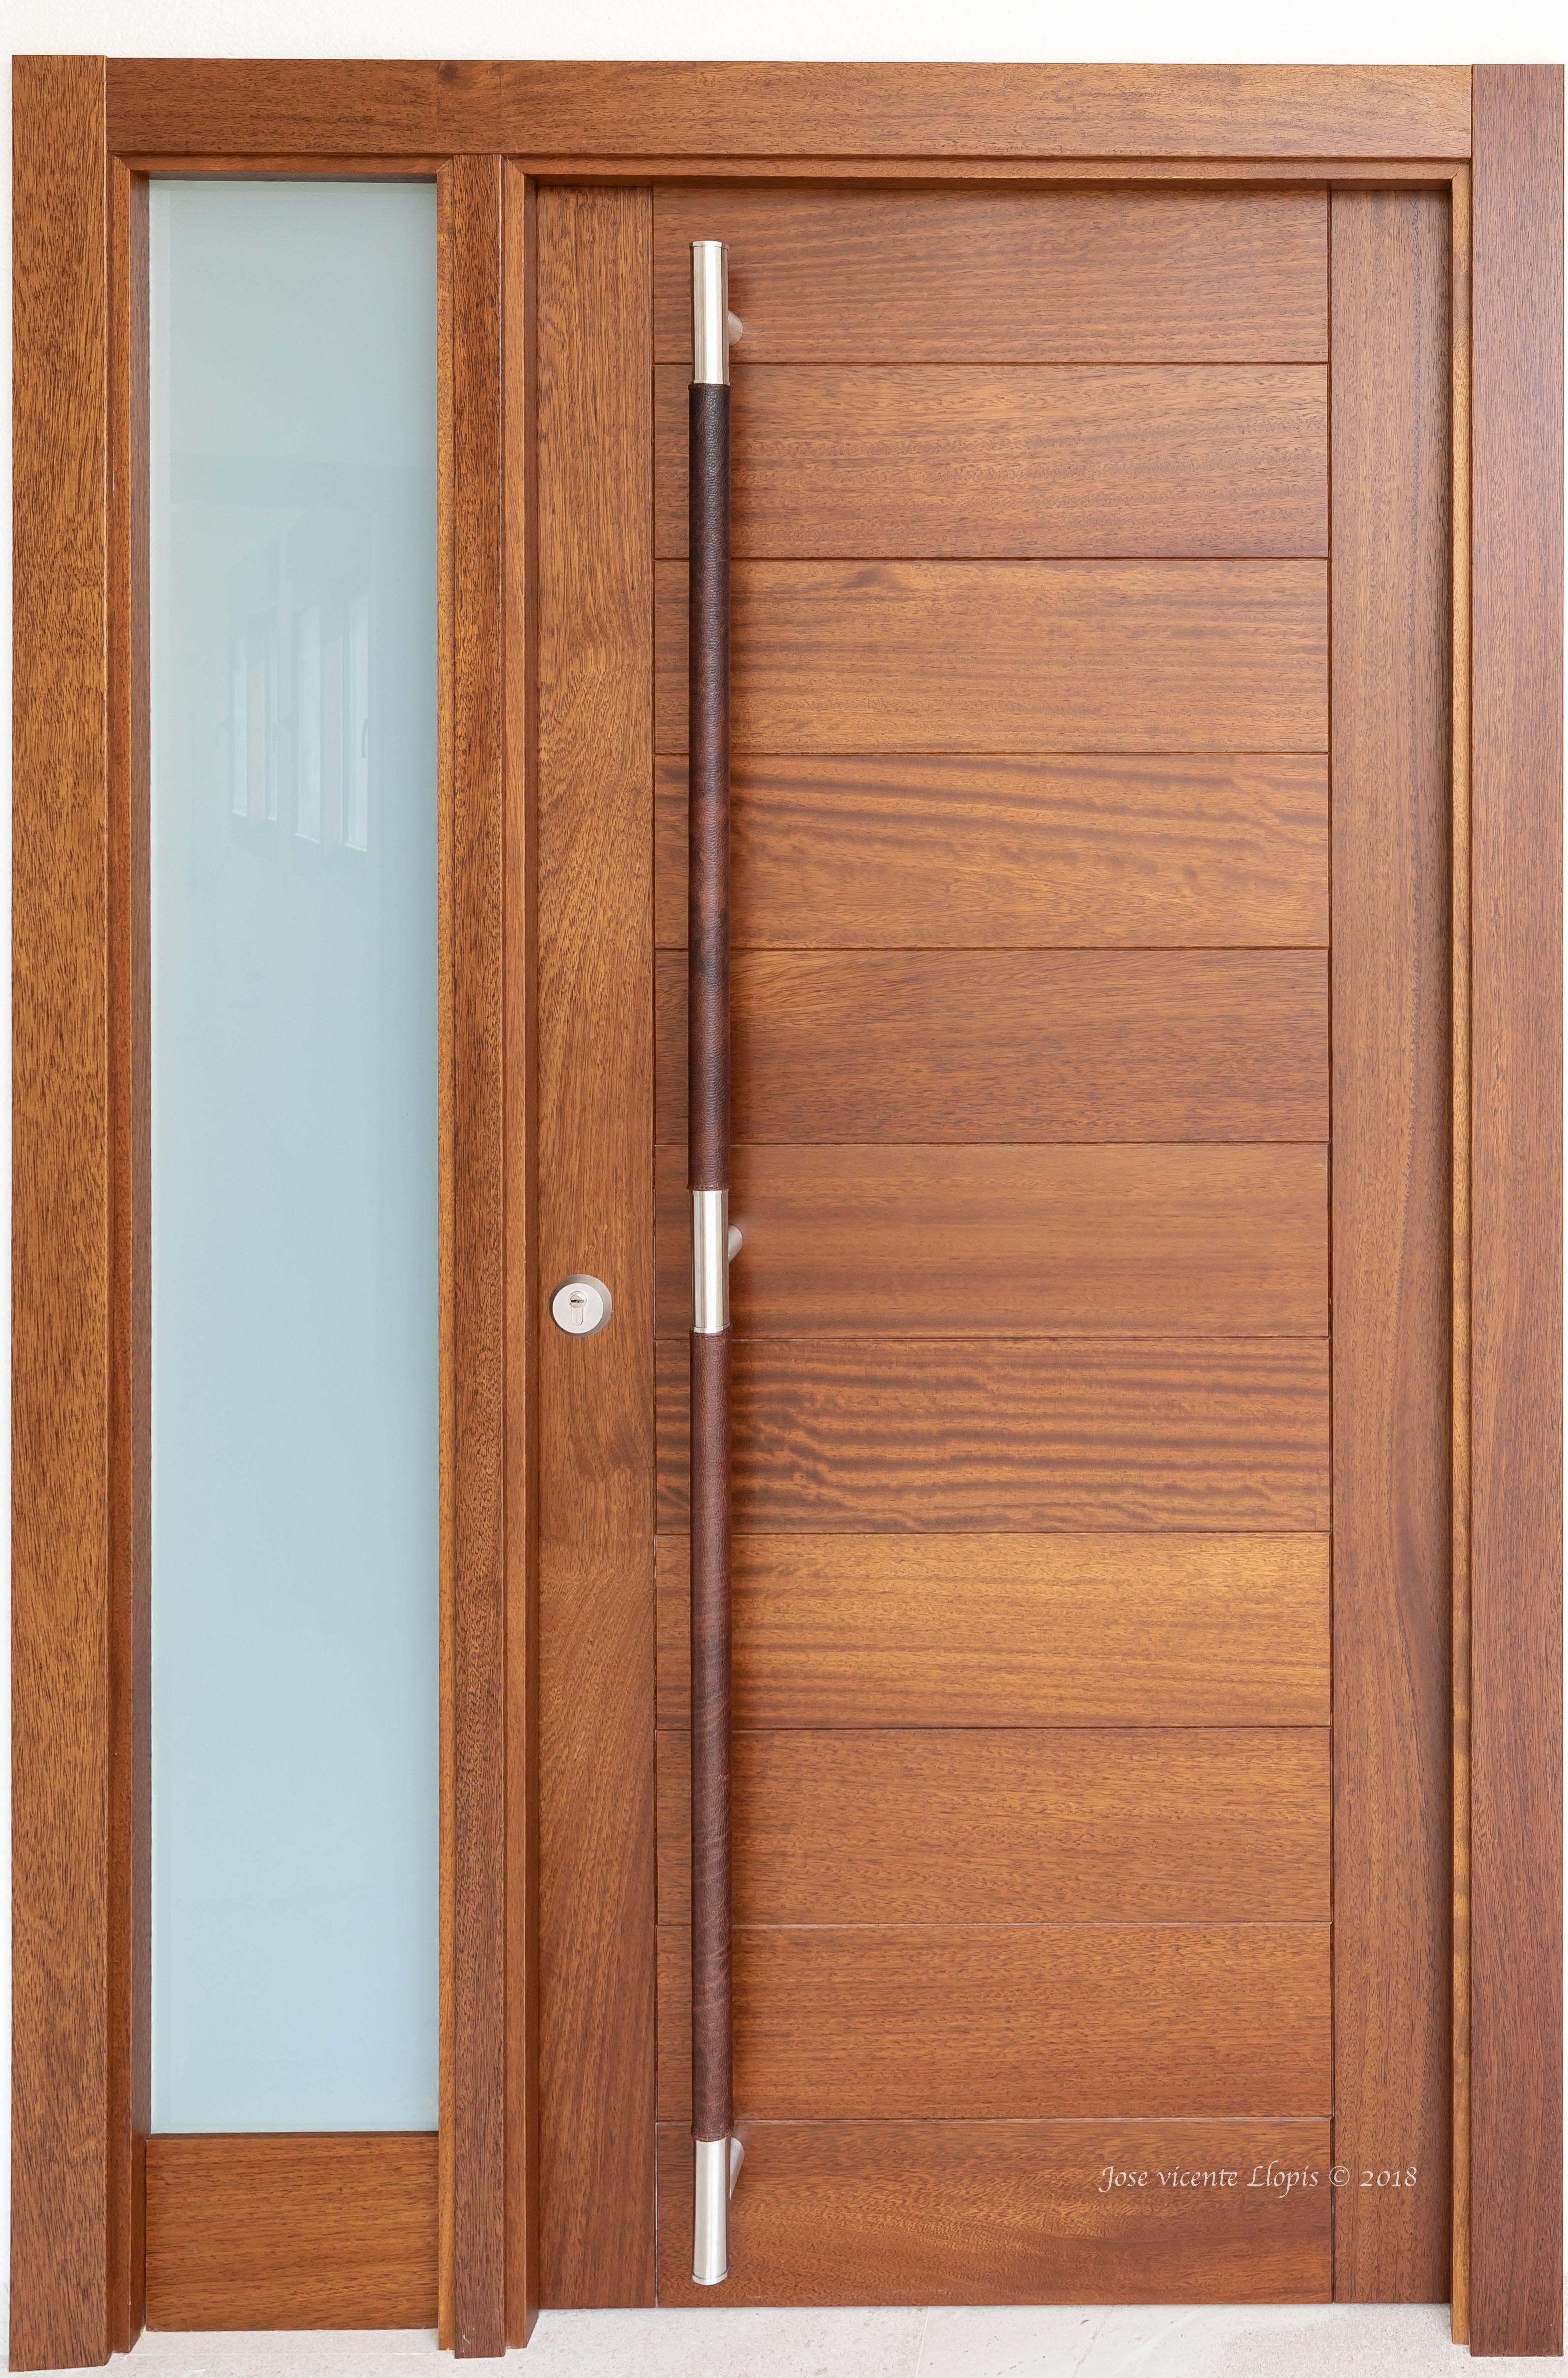 Puertas: Productos de Carpintería Llopis